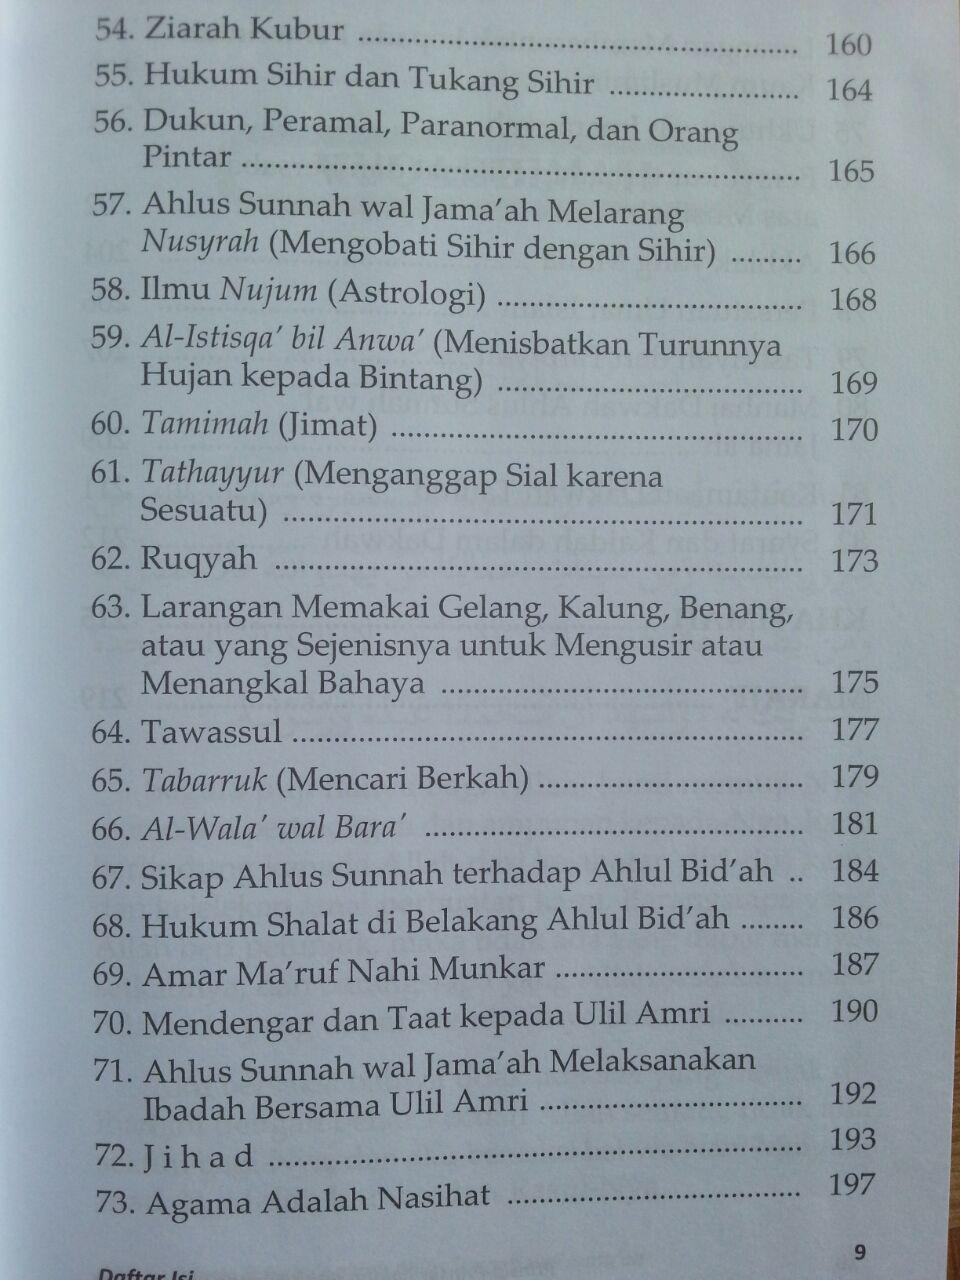 Buku Prinsip-Prinsip Aqidah Ahlus Sunnah Wal Jamaah isi